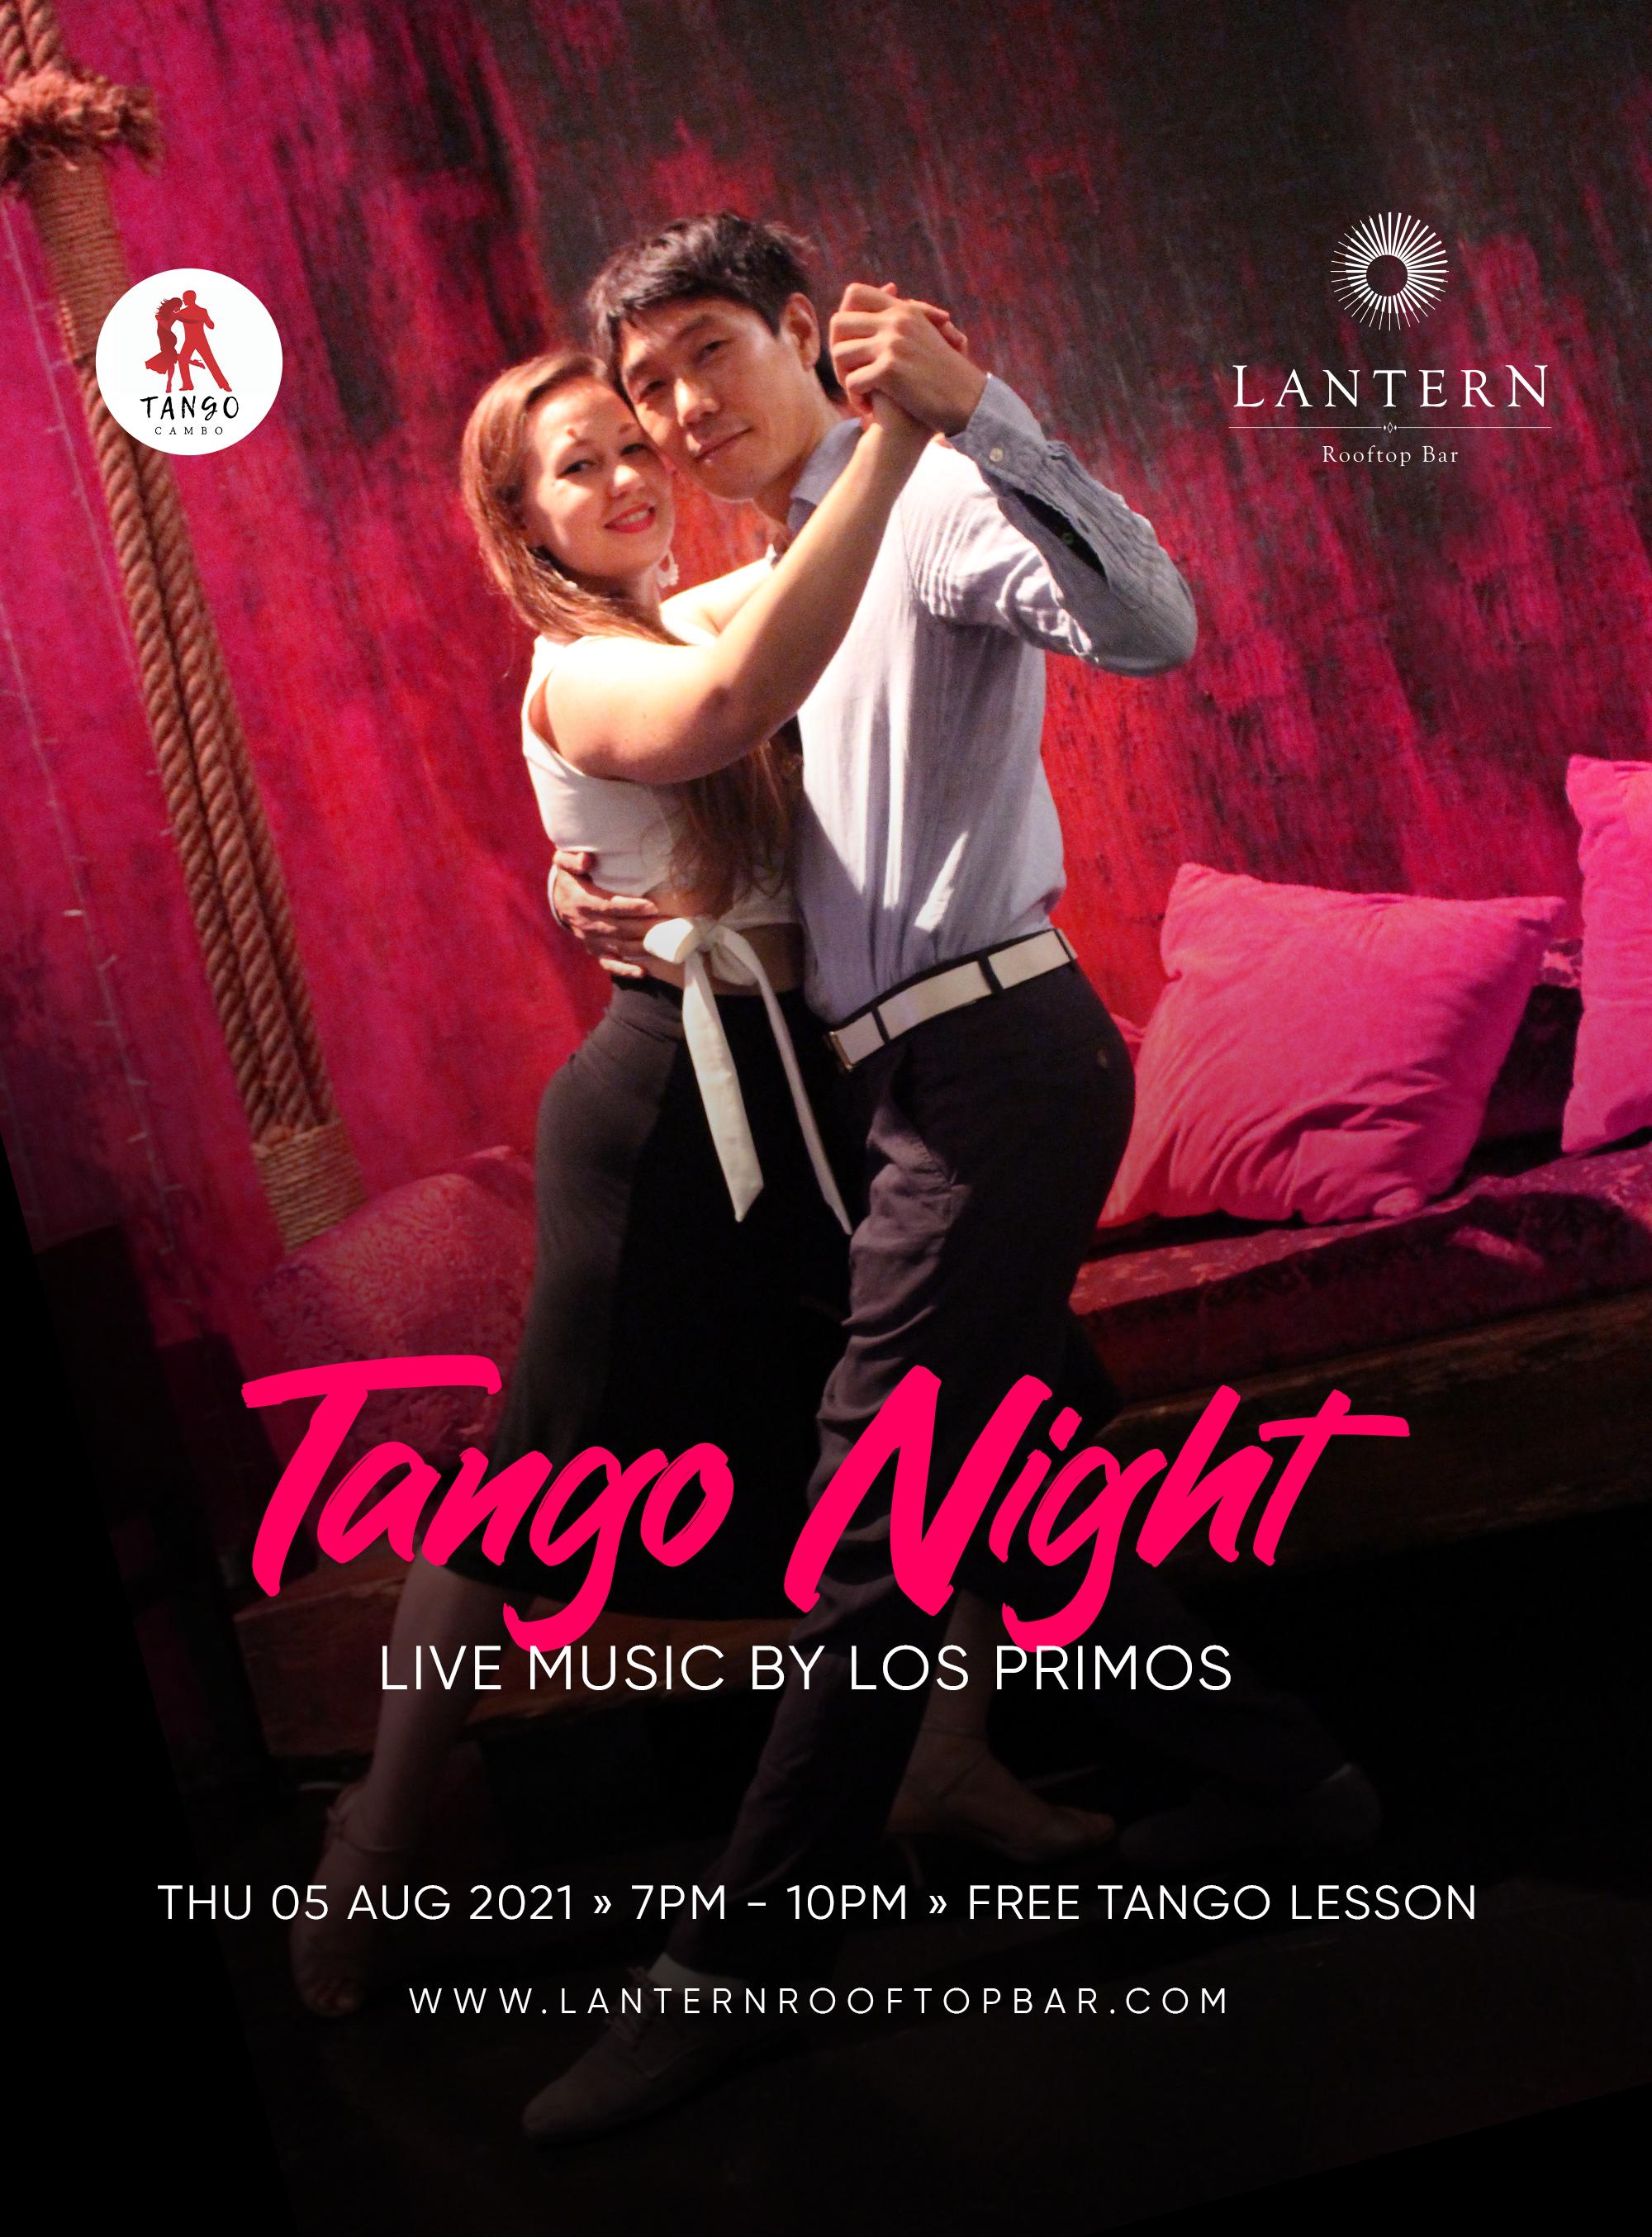 Tango Night – Thursday 5 August 2021